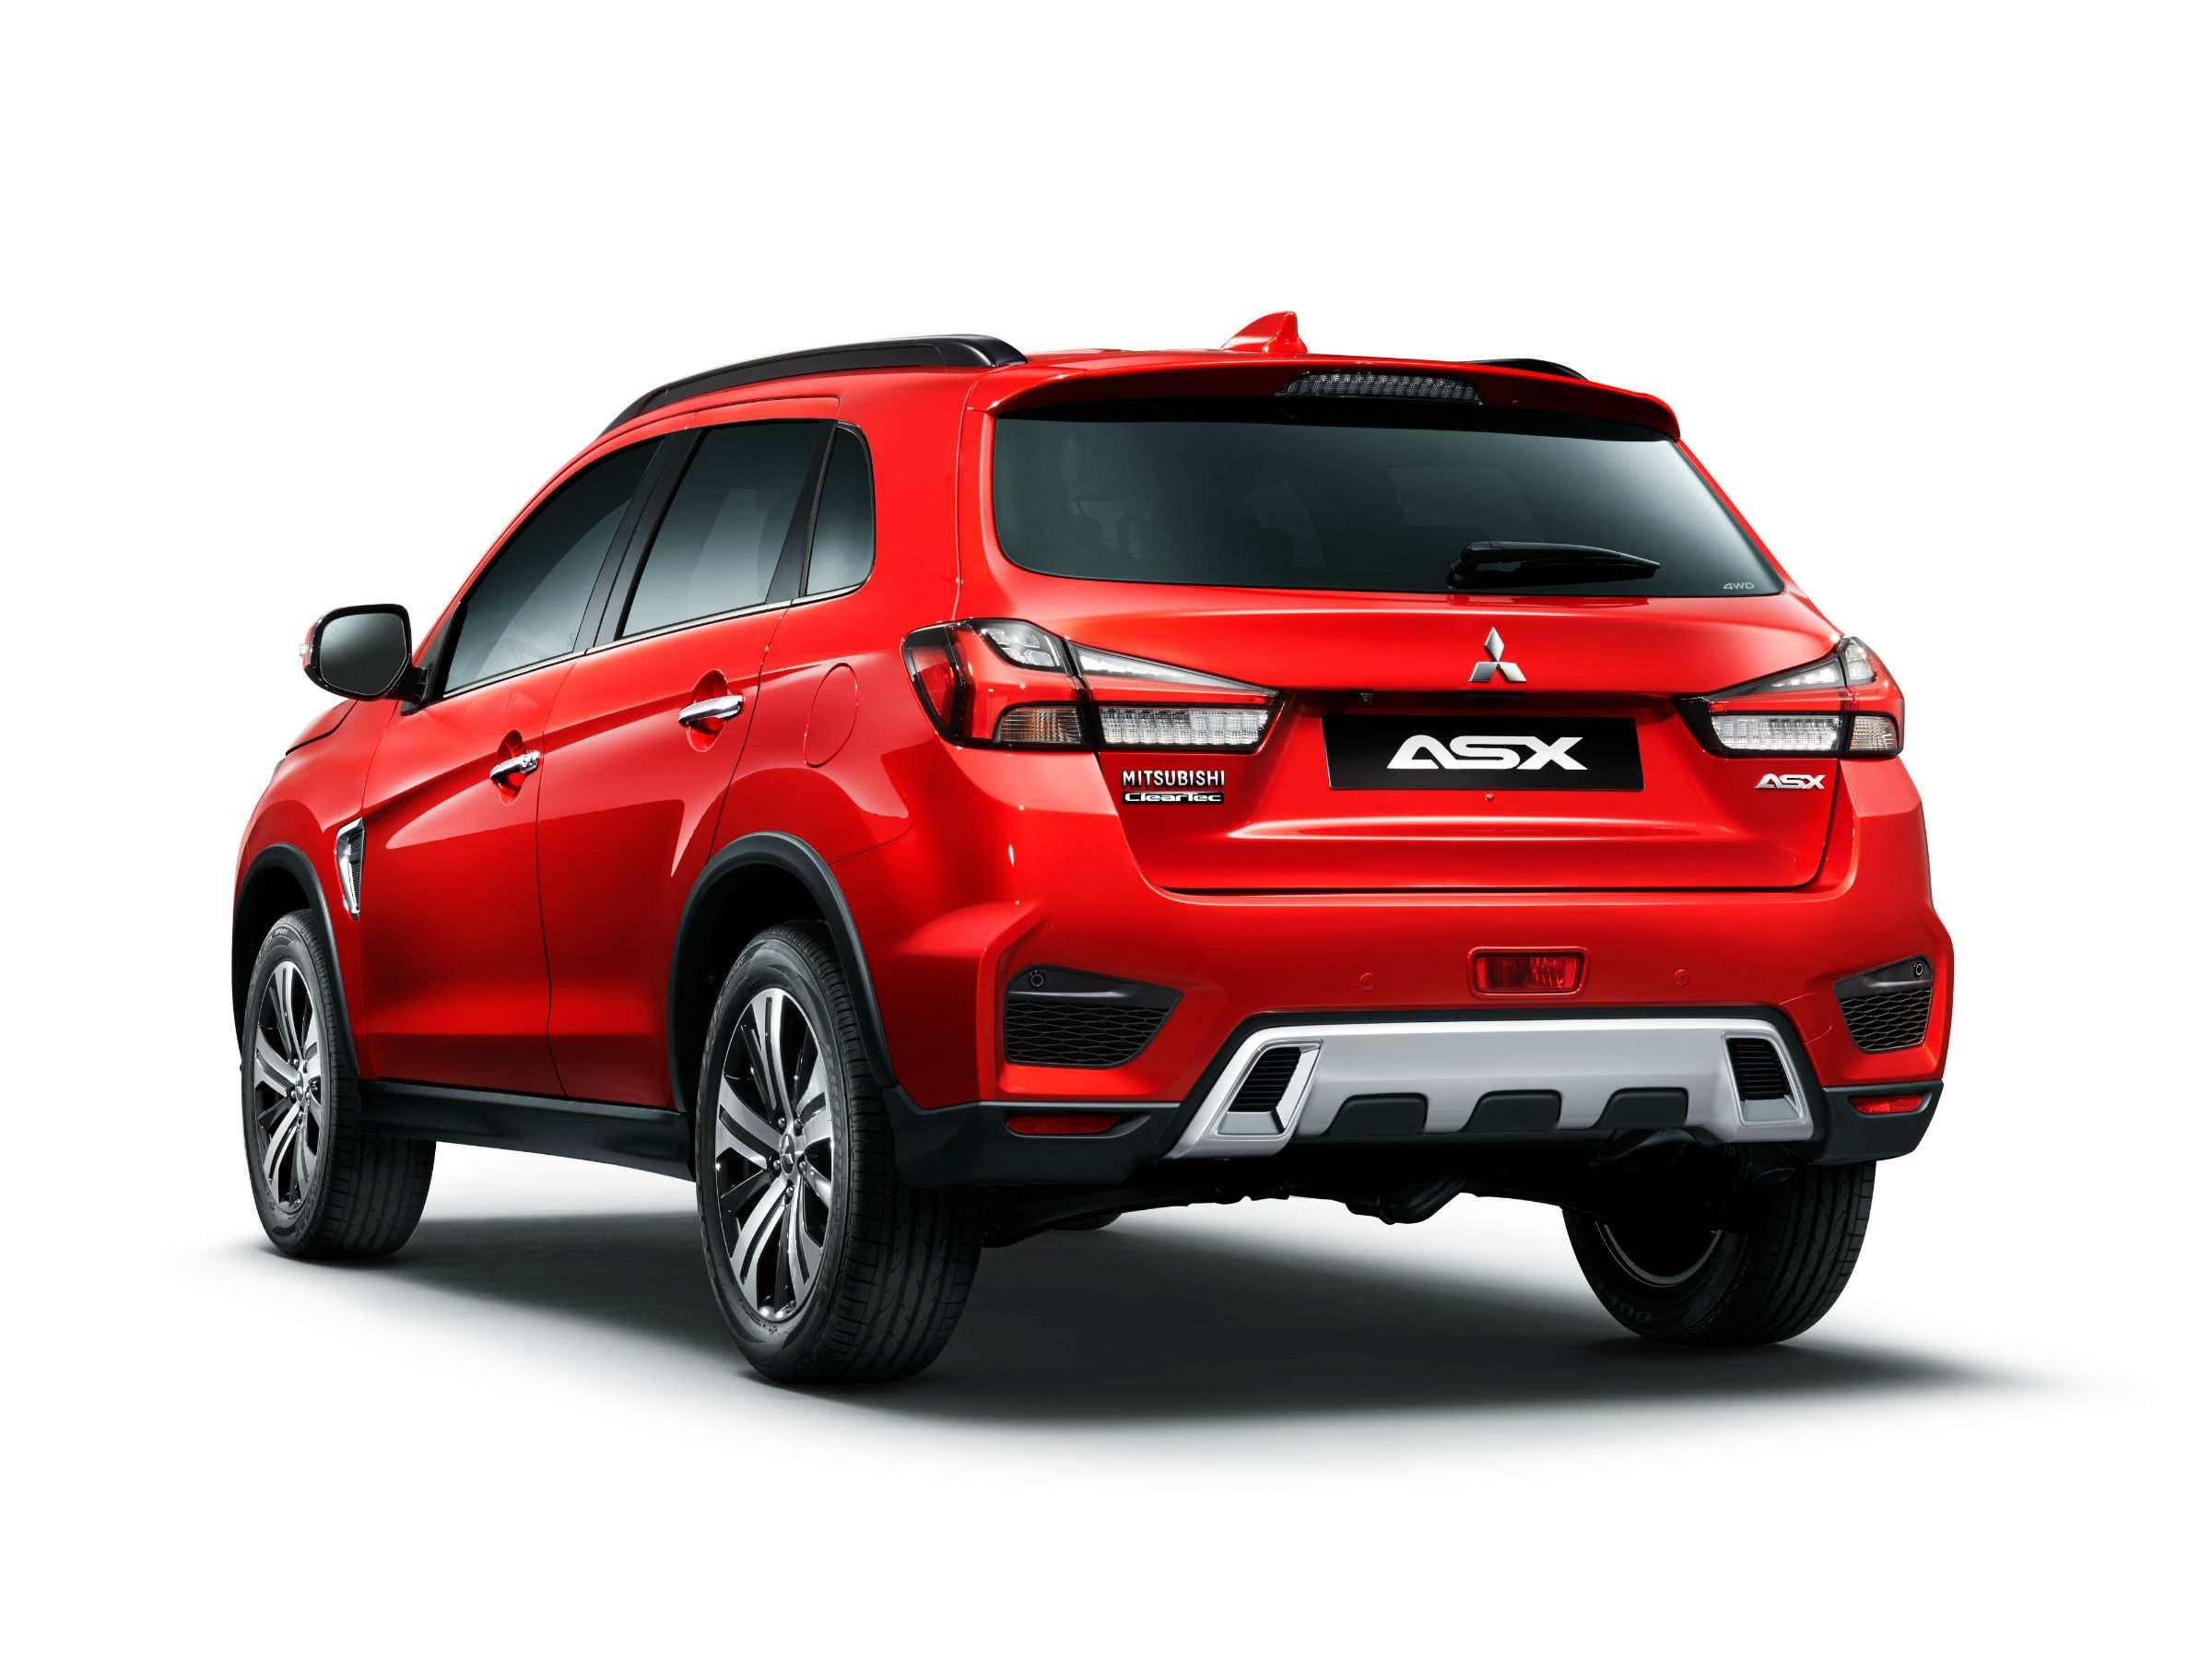 22 Best Review Mitsubishi Asx 2020 Dane Techniczne Configurations for Mitsubishi Asx 2020 Dane Techniczne